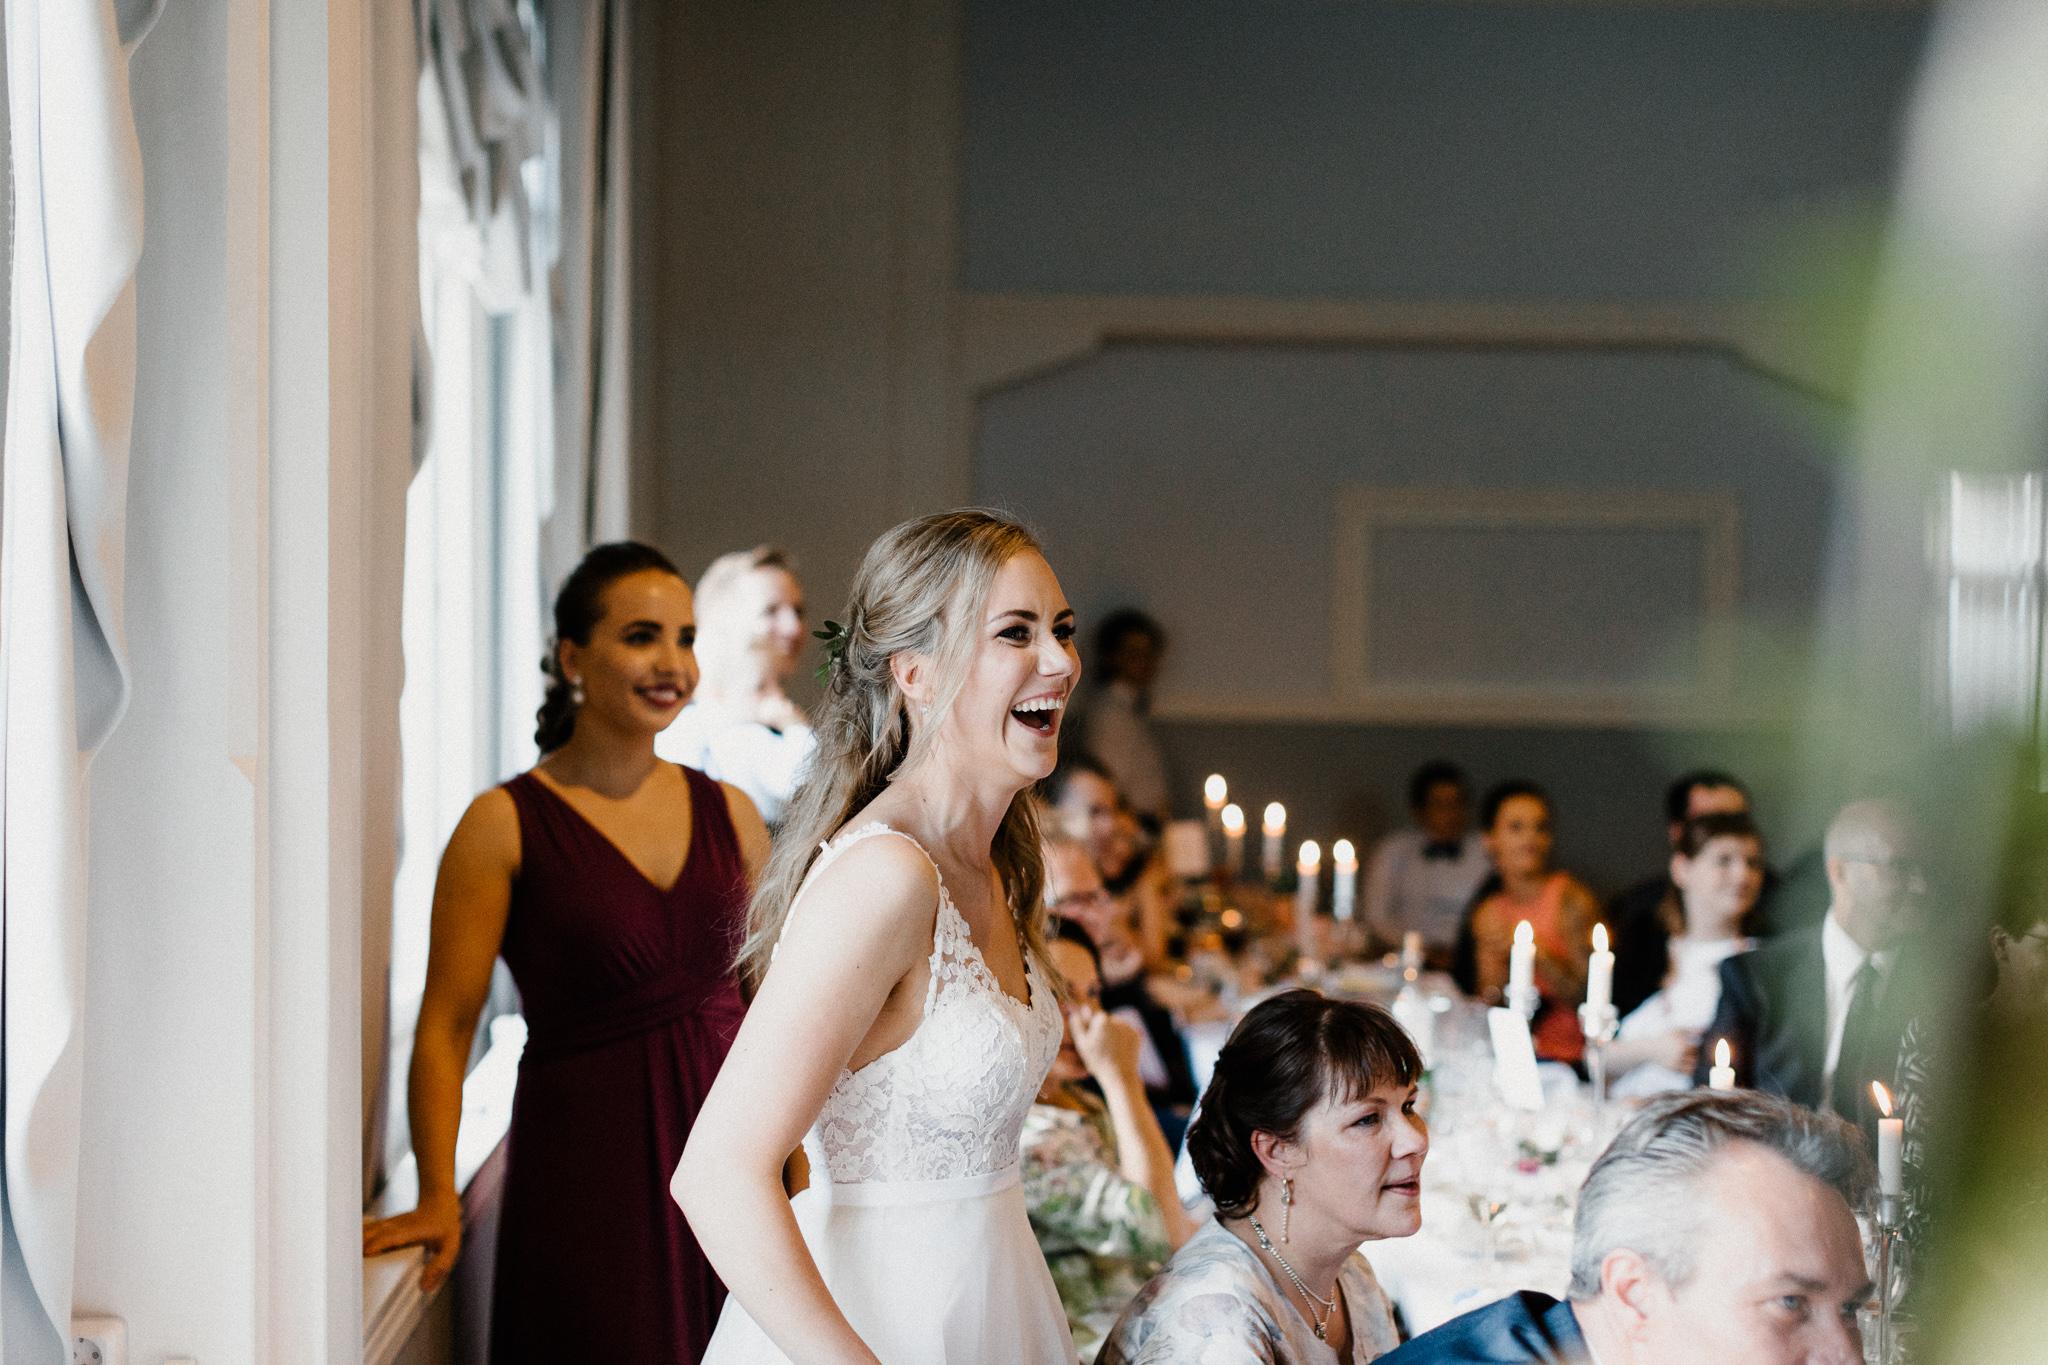 Johanna + Mikko - Tampere - Photo by Patrick Karkkolainen Wedding Photographer-117.jpg